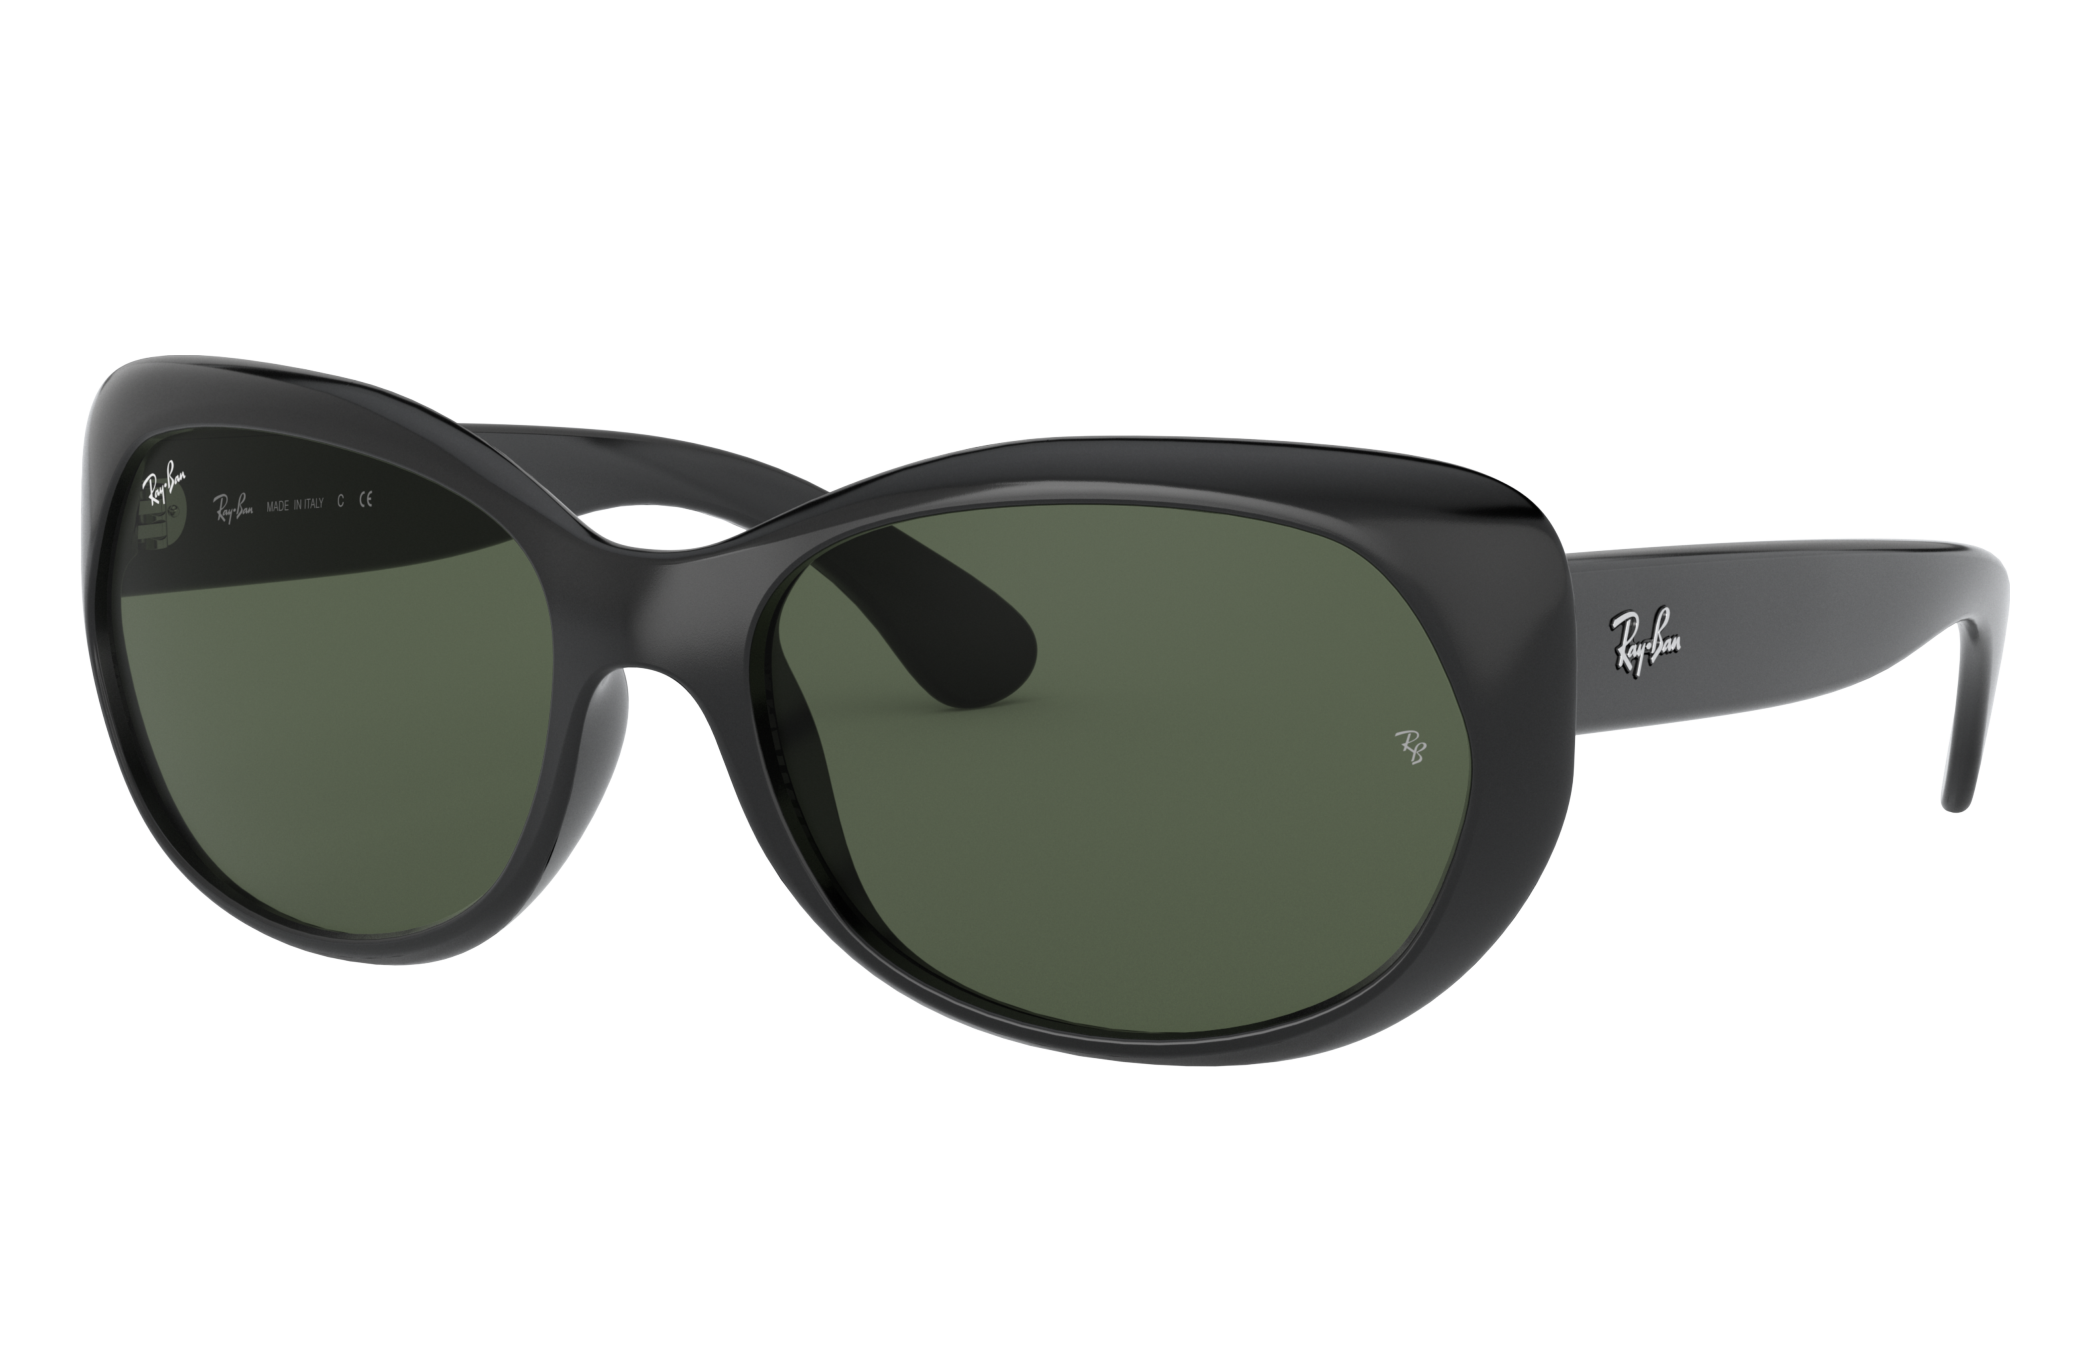 Ray-Ban Rb4325 Black, Green Lenses - RB4325